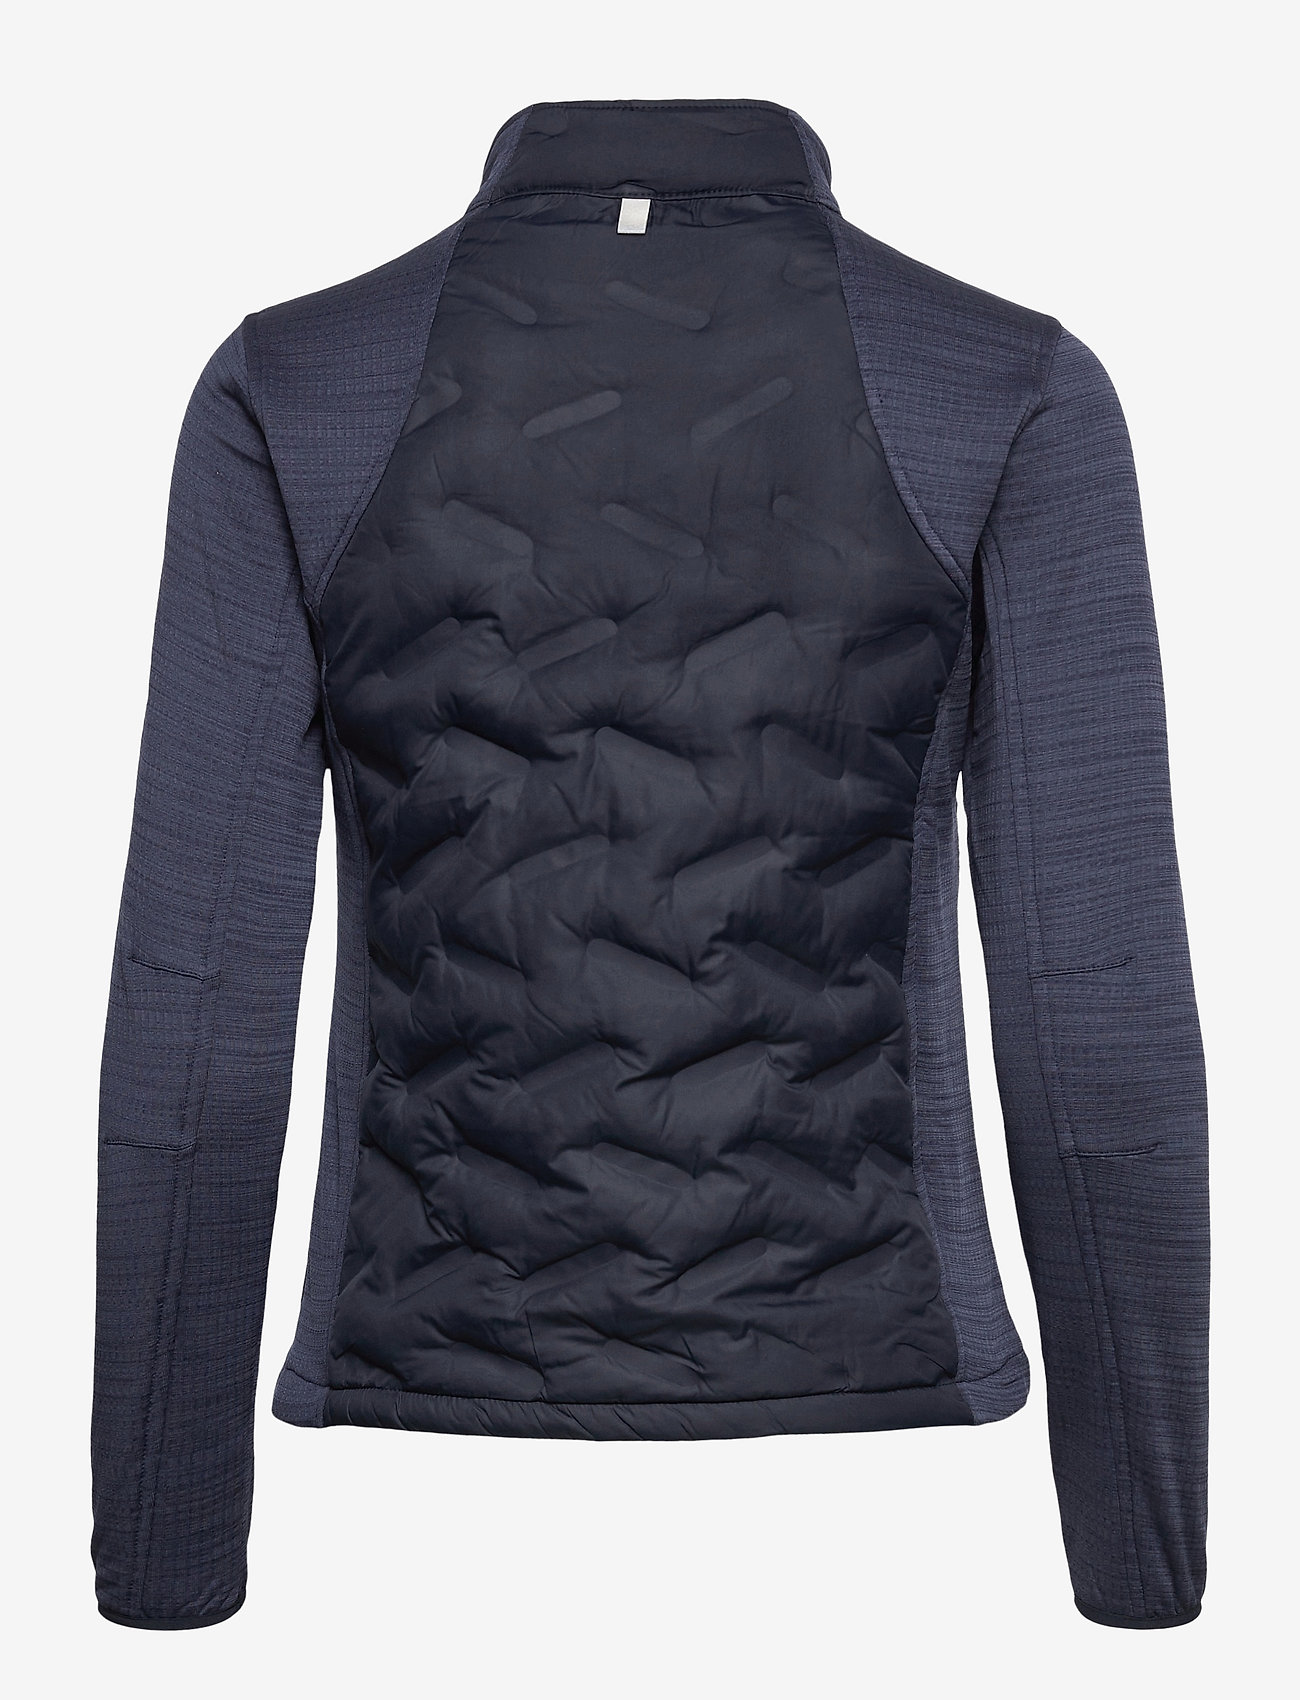 Abacus - Lds Dunes hybrid jacket - golf jassen - navy - 1